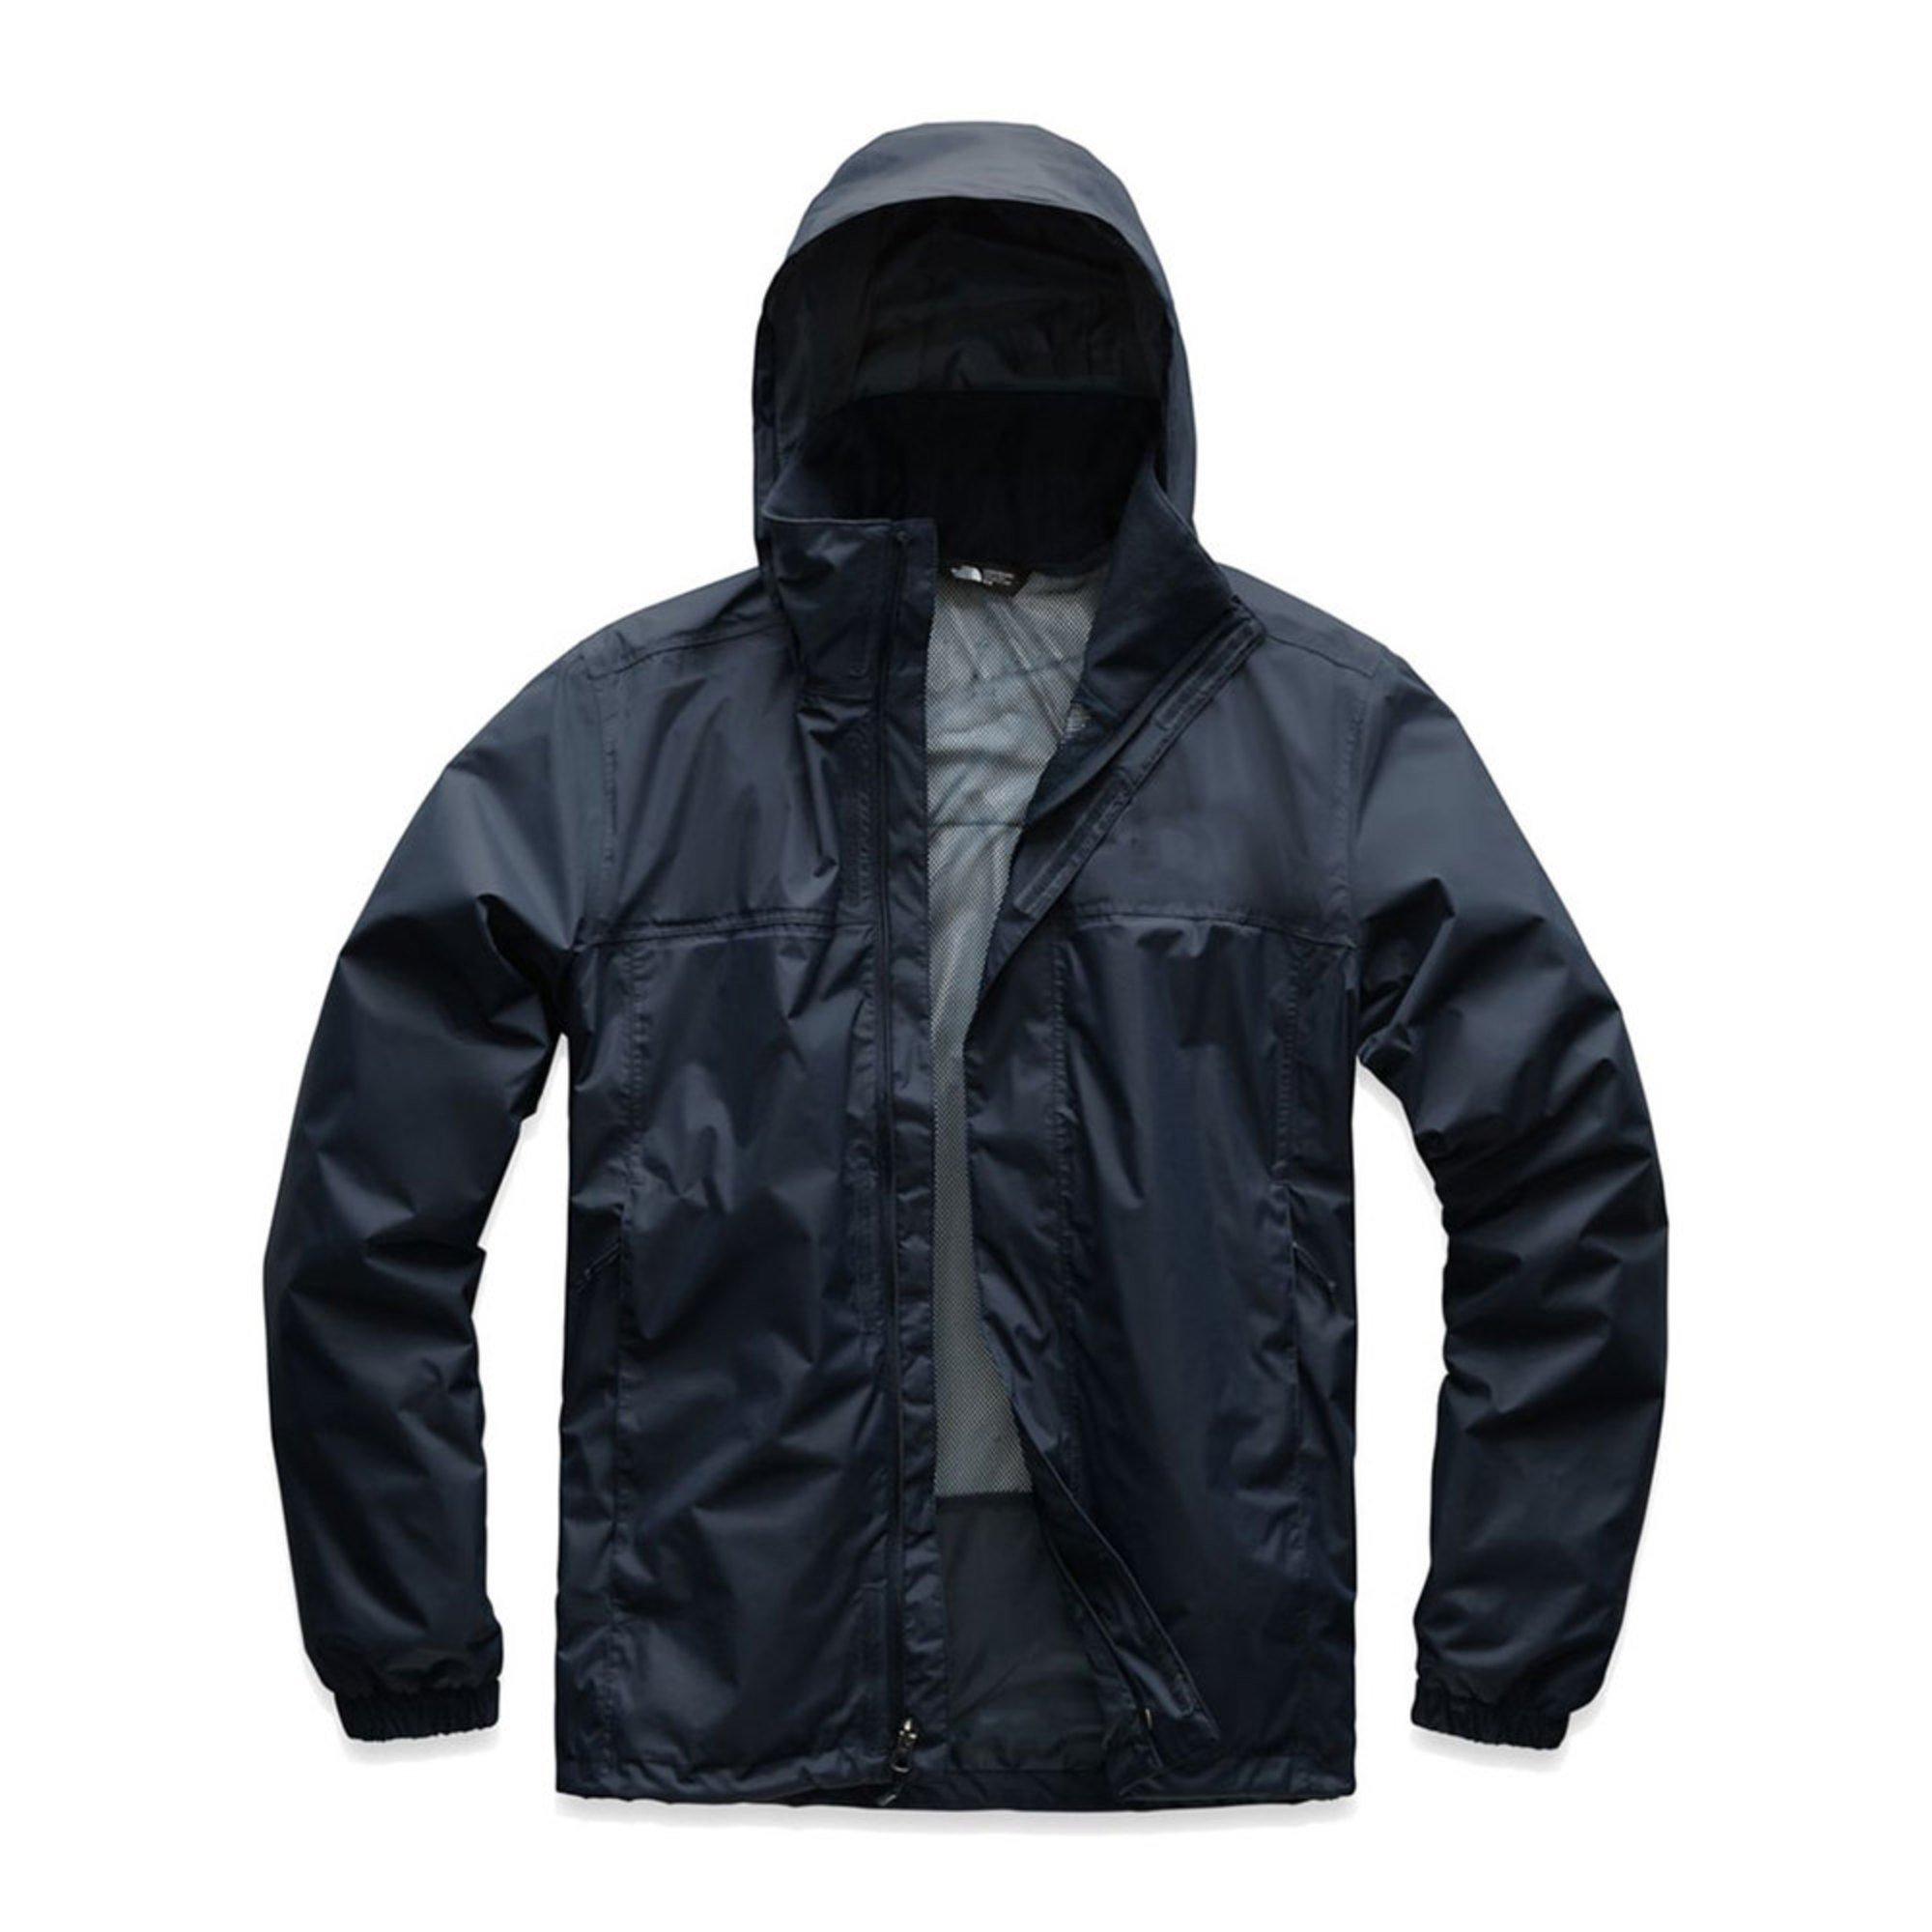 efc3bb920 The North Face Men's Resolve 2 Rain Jacket